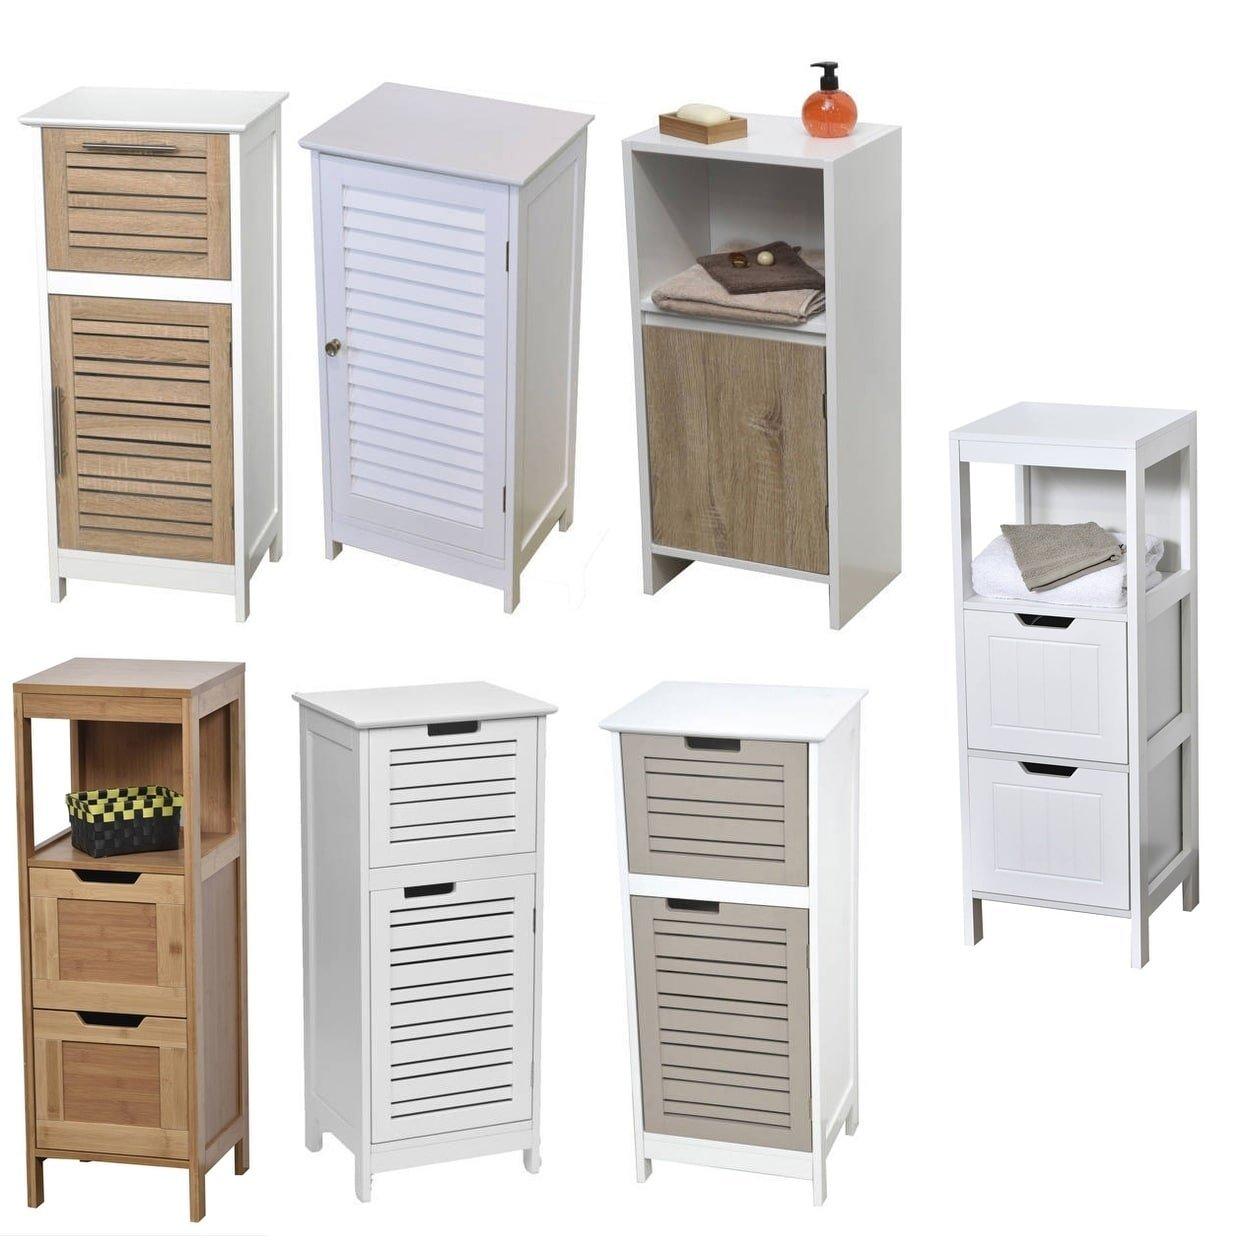 Colonne Salle De Bain Slim ~ tendance colonne meuble bas de salle de bain 1 porte et 1 tiroir